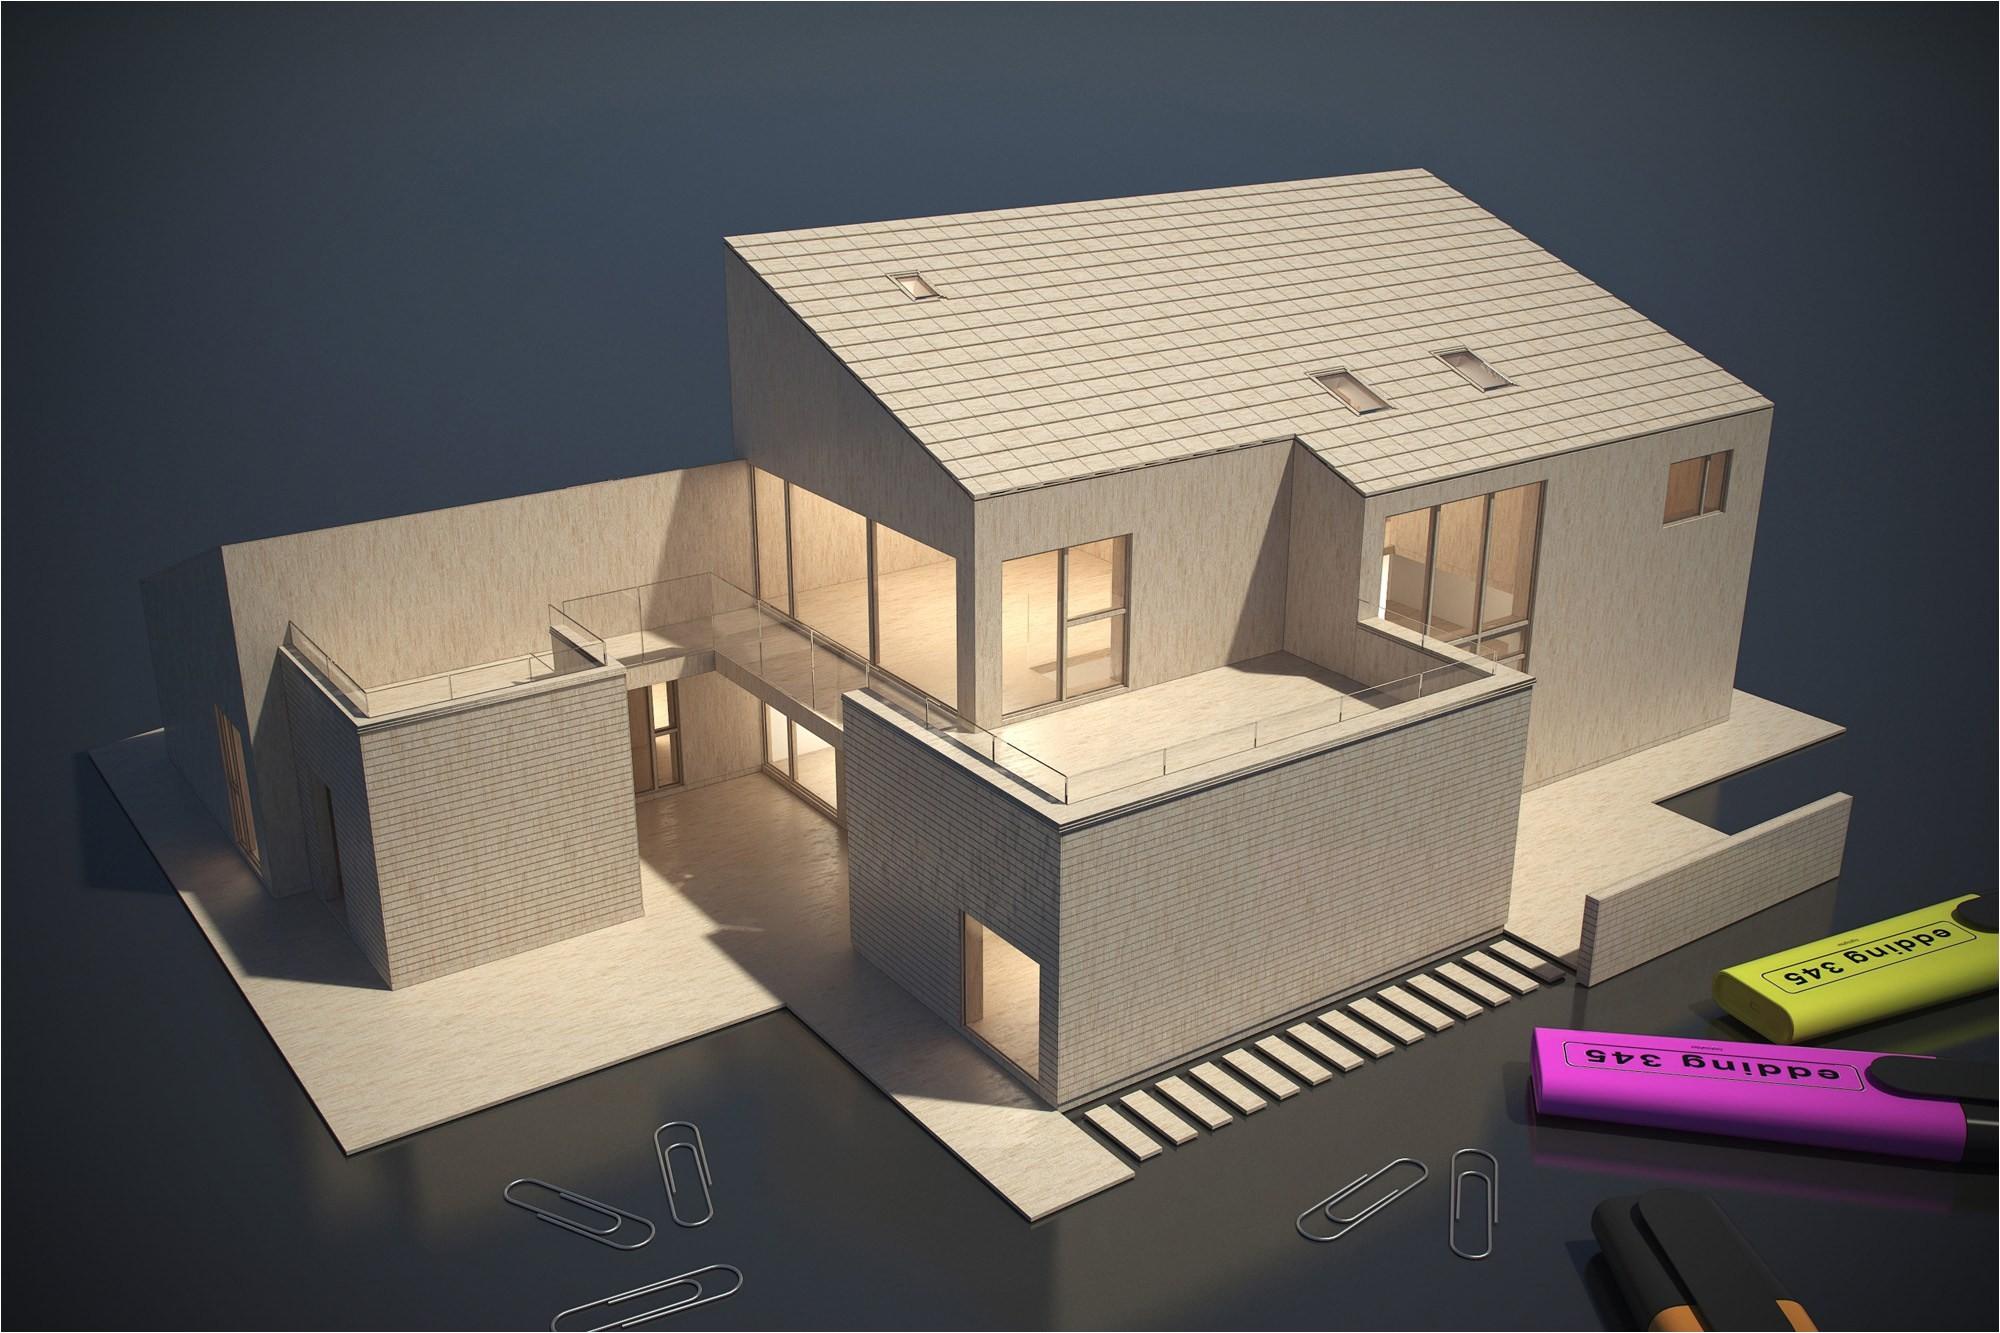 balsa wood house model kits